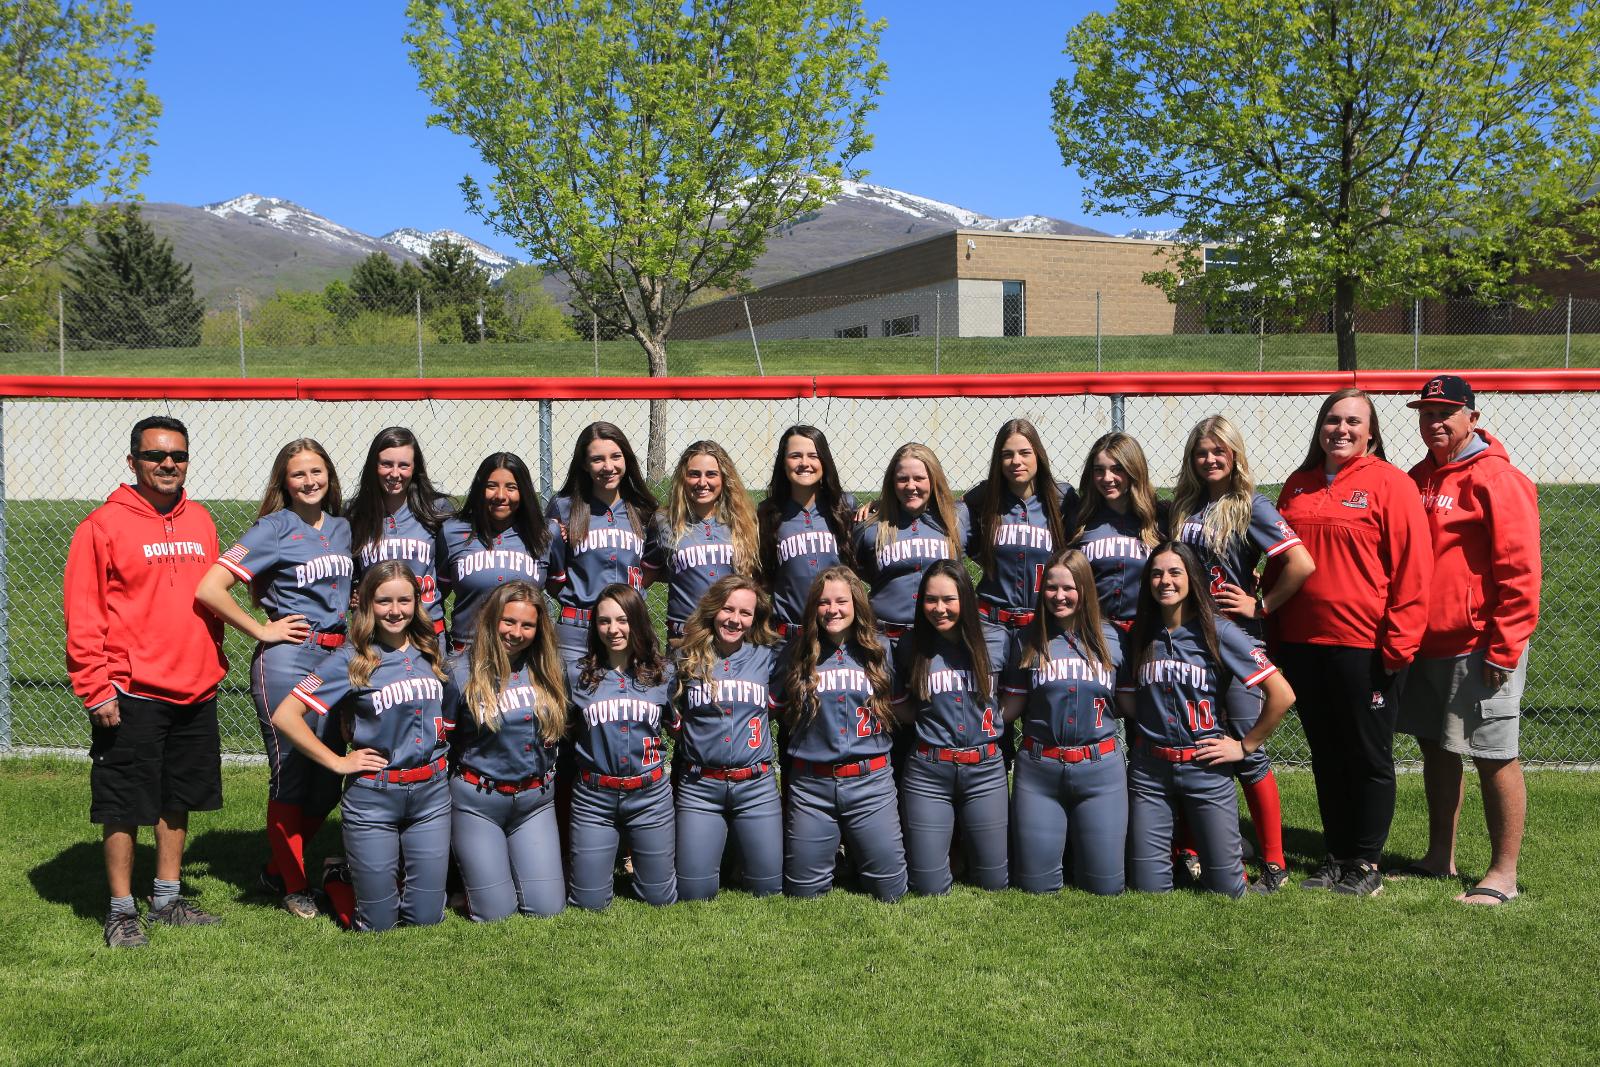 Lady Braves Softball Wins Region 5 Crown